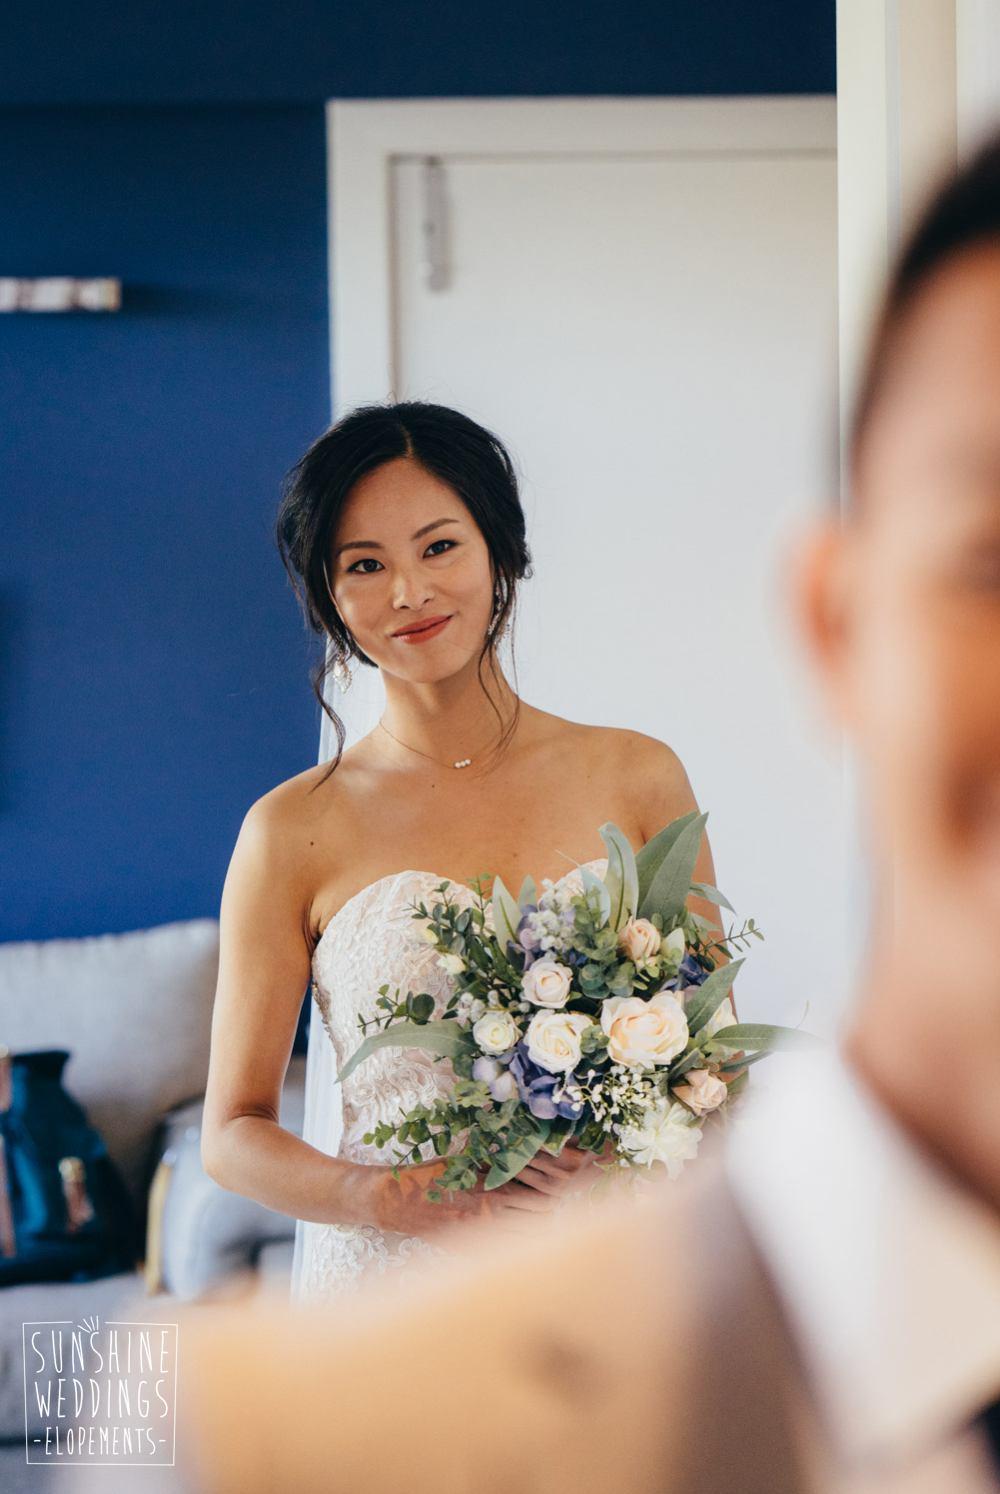 First look Queenstonw wedding photo